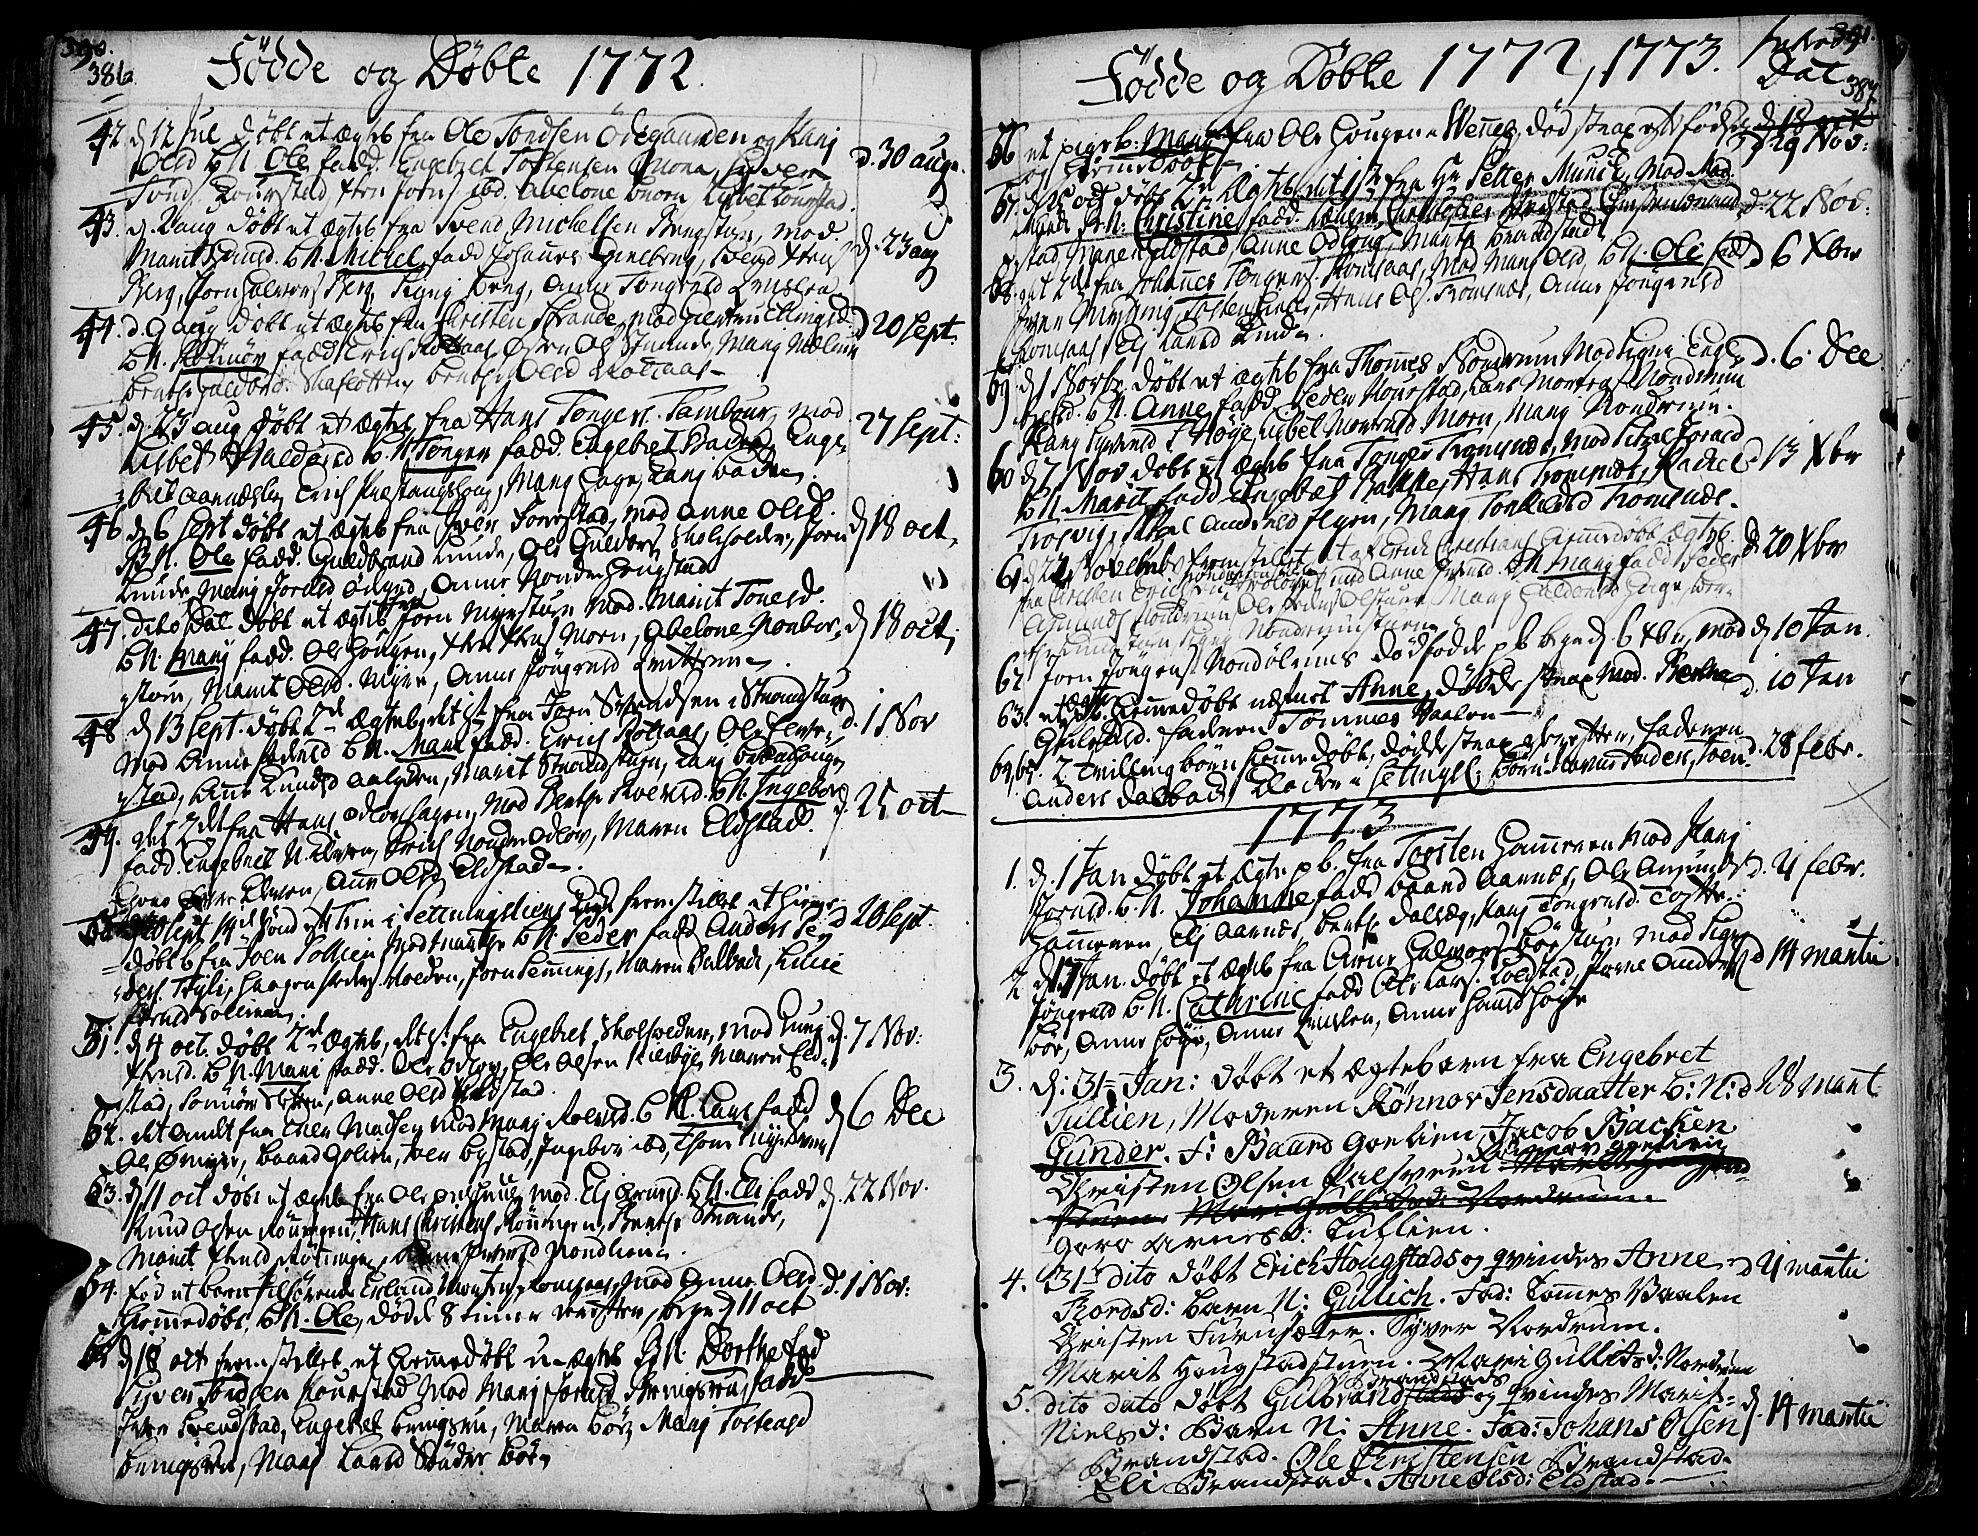 SAH, Ringebu prestekontor, Ministerialbok nr. 2, 1734-1780, s. 386-387